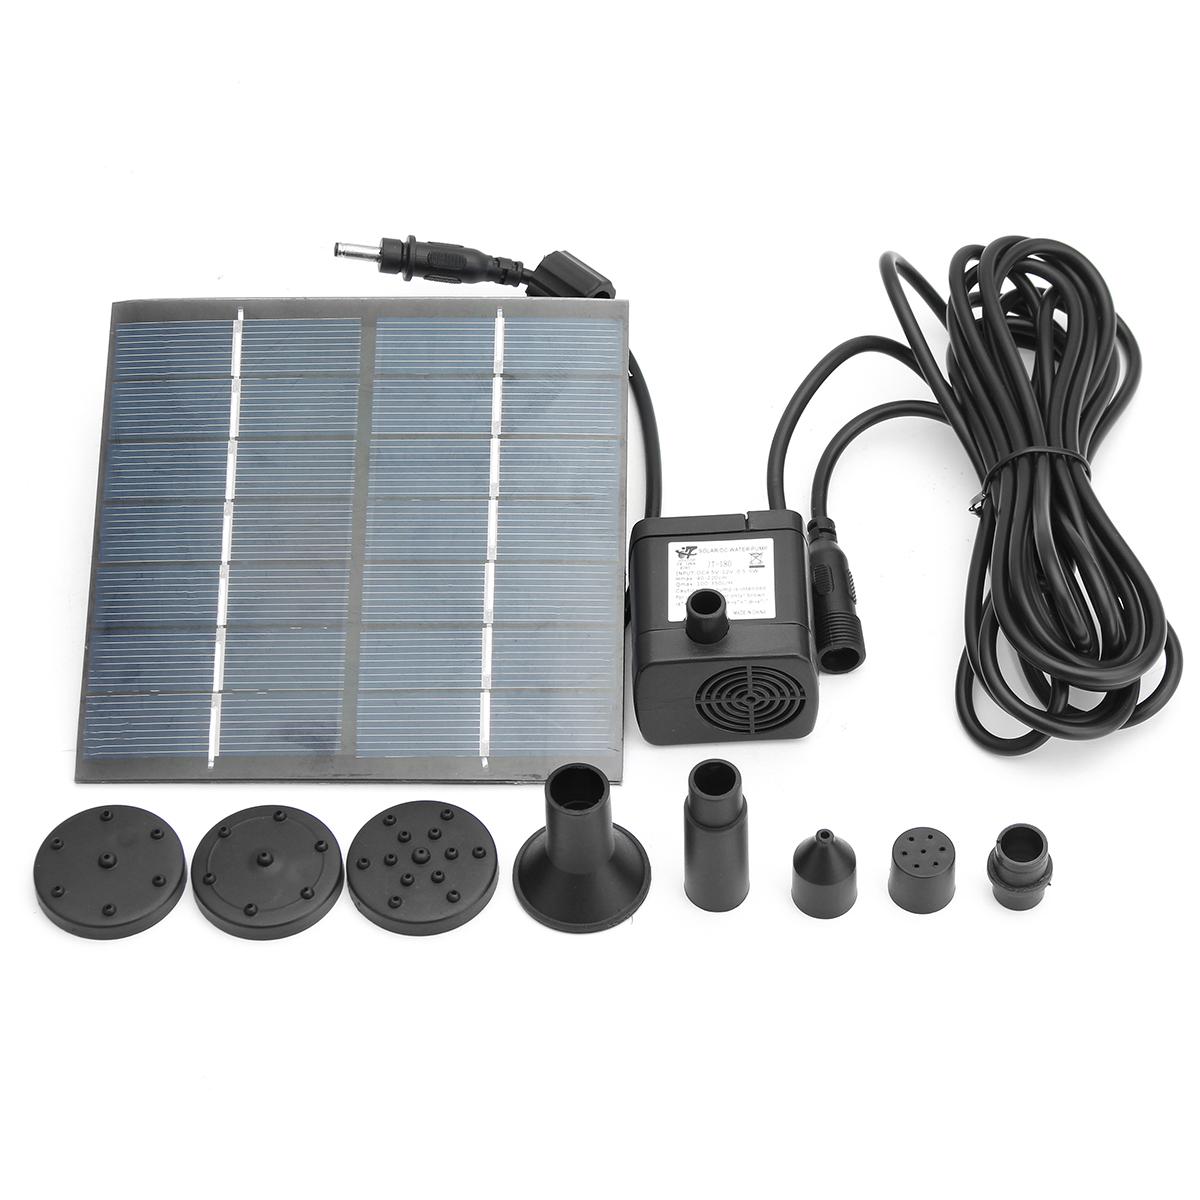 Jt 180 1 4w 7v Solar Panel Power Fountain Pump Outdoor